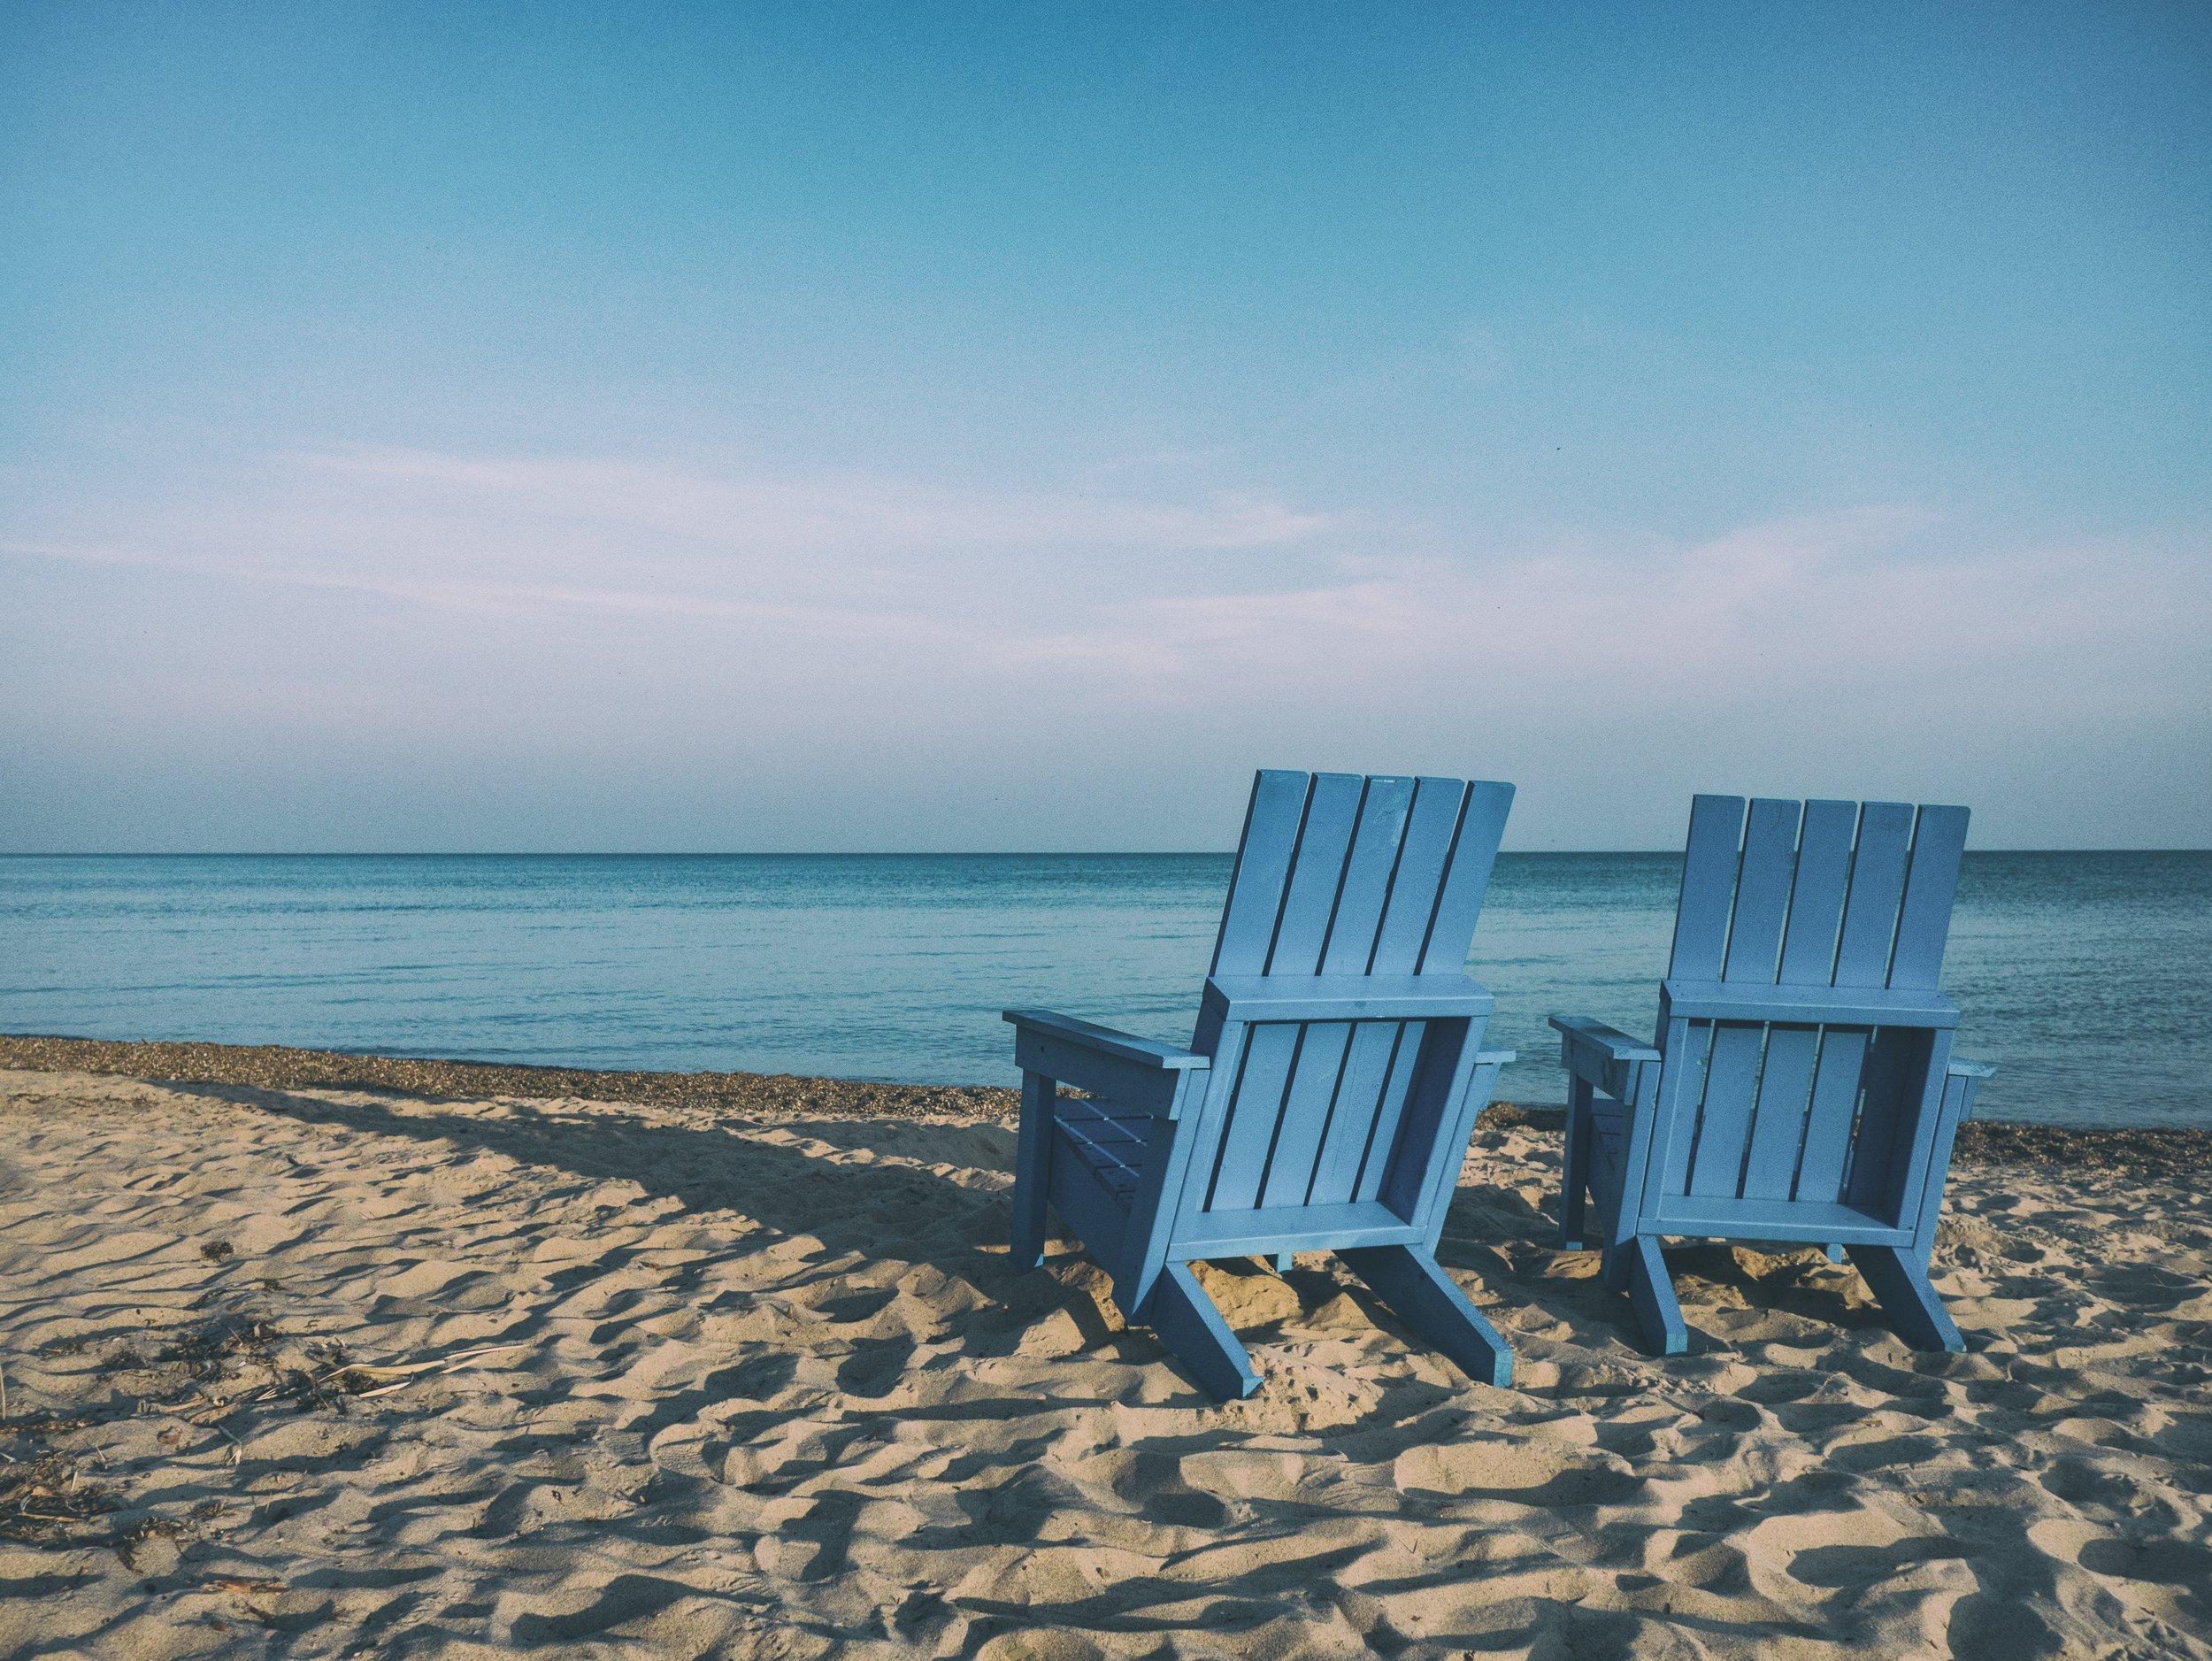 two blue chairs backstory preaching community aaron-burden-133359.jpg